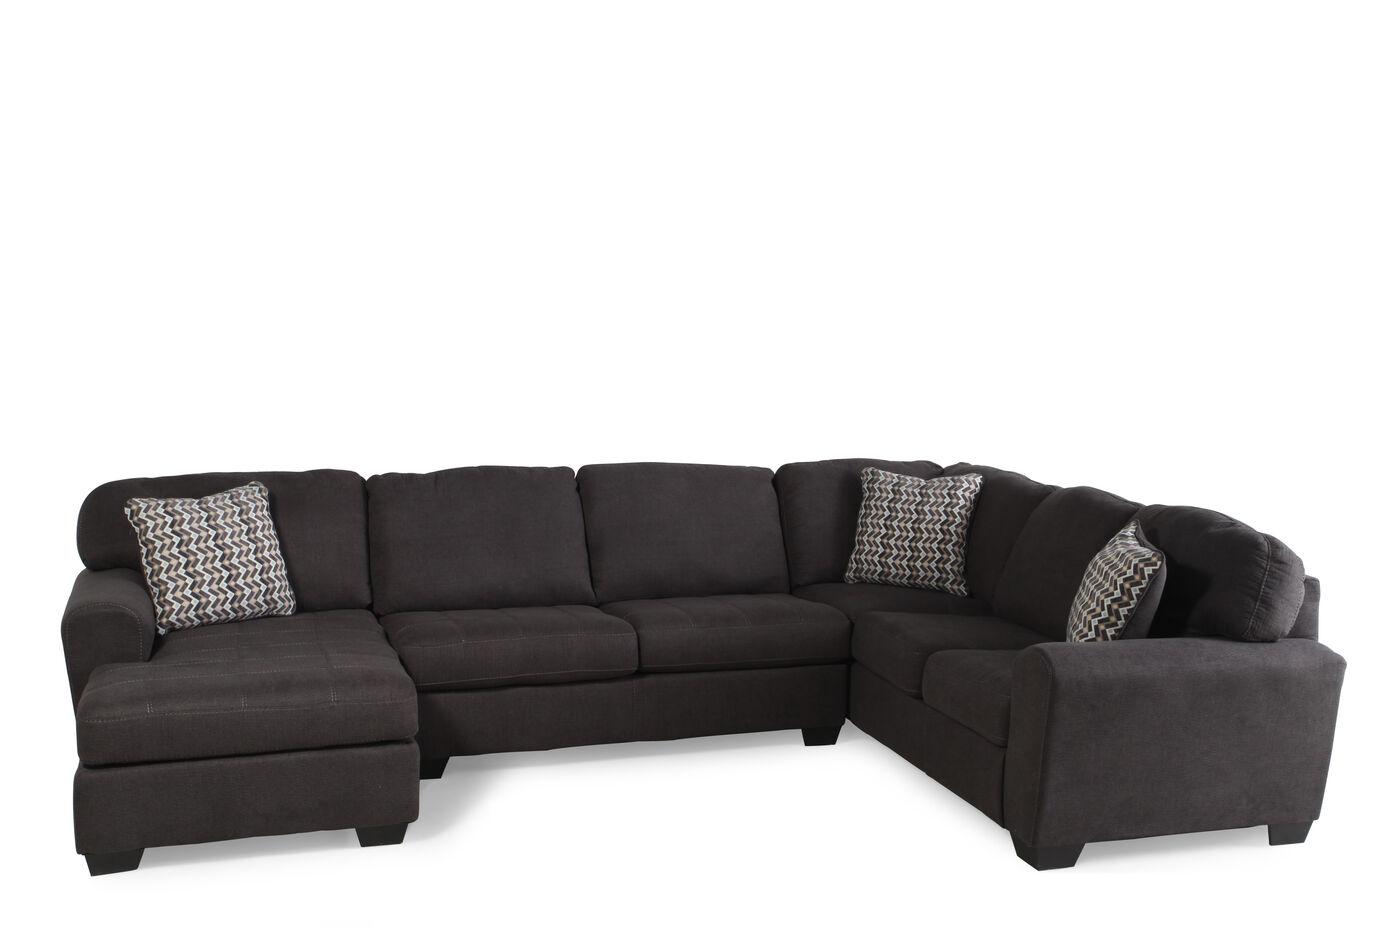 Three piece microfiber 145quot sectional in dark slate for 3 piece microfiber recliner sectional sofa